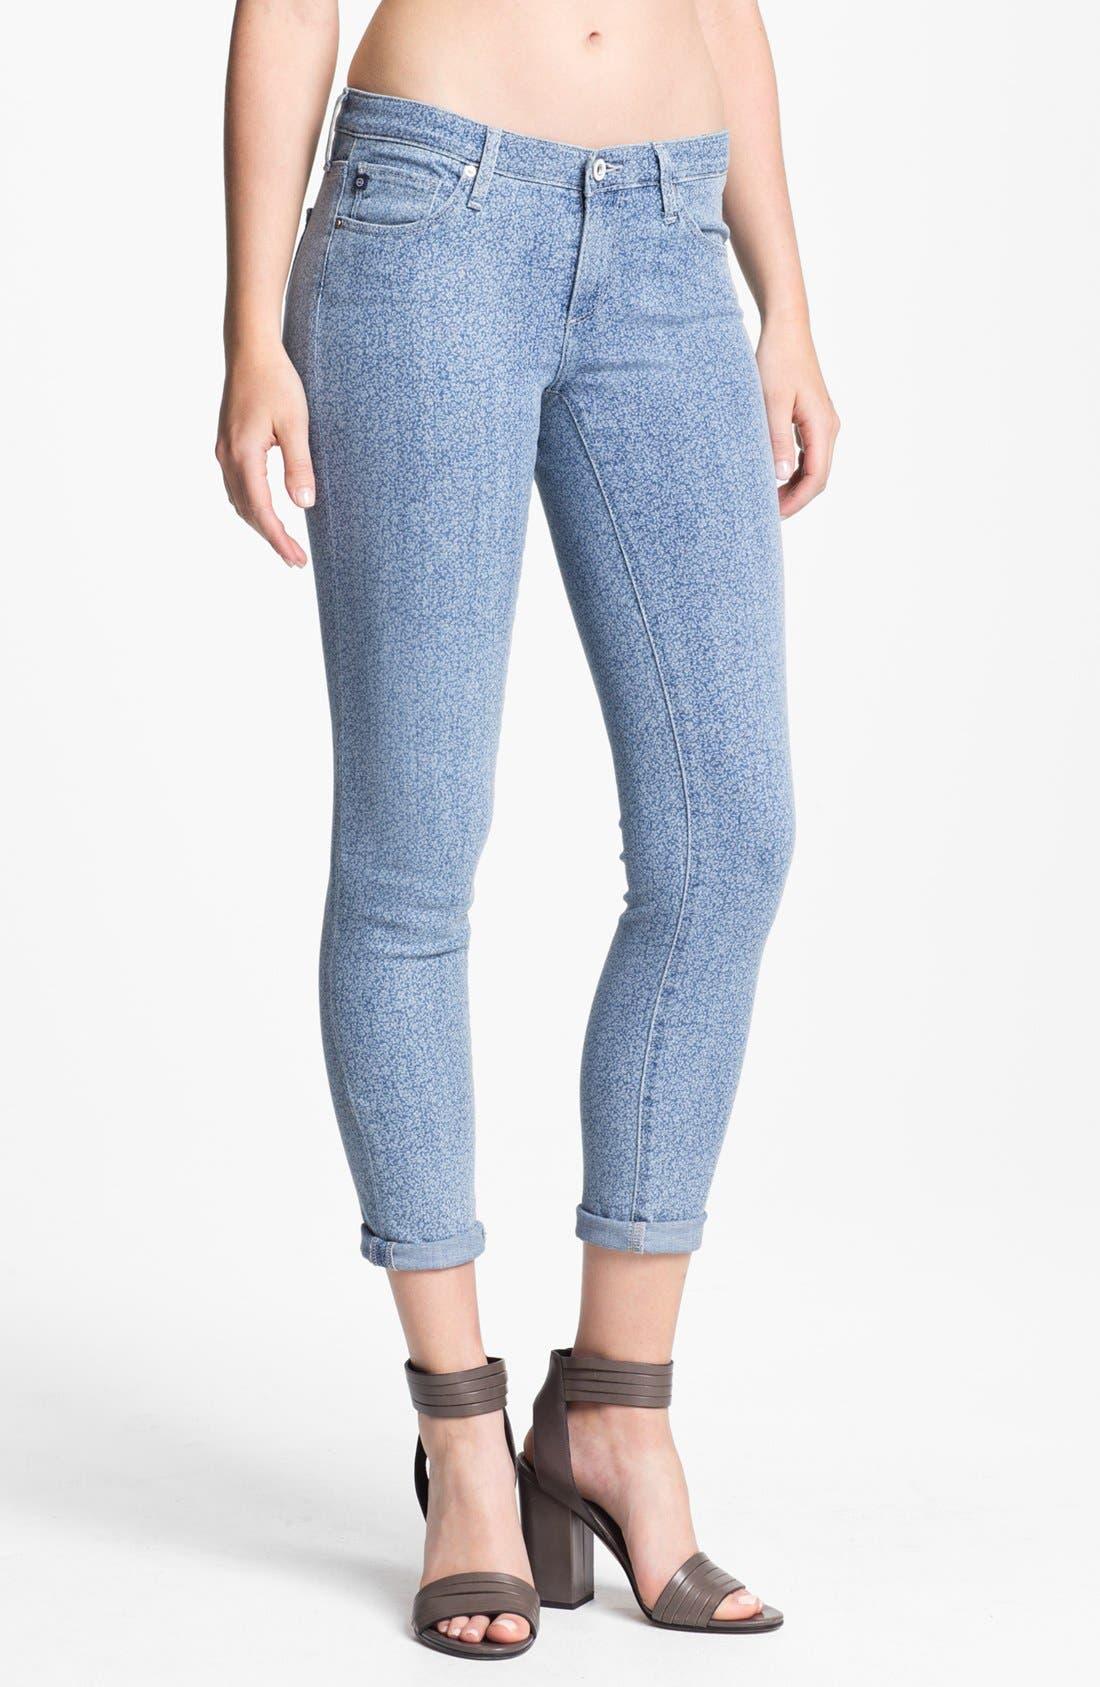 Alternate Image 1 Selected - AG Jeans 'Liberty of London' Print Denim Ankle Legging (Denim Isla)